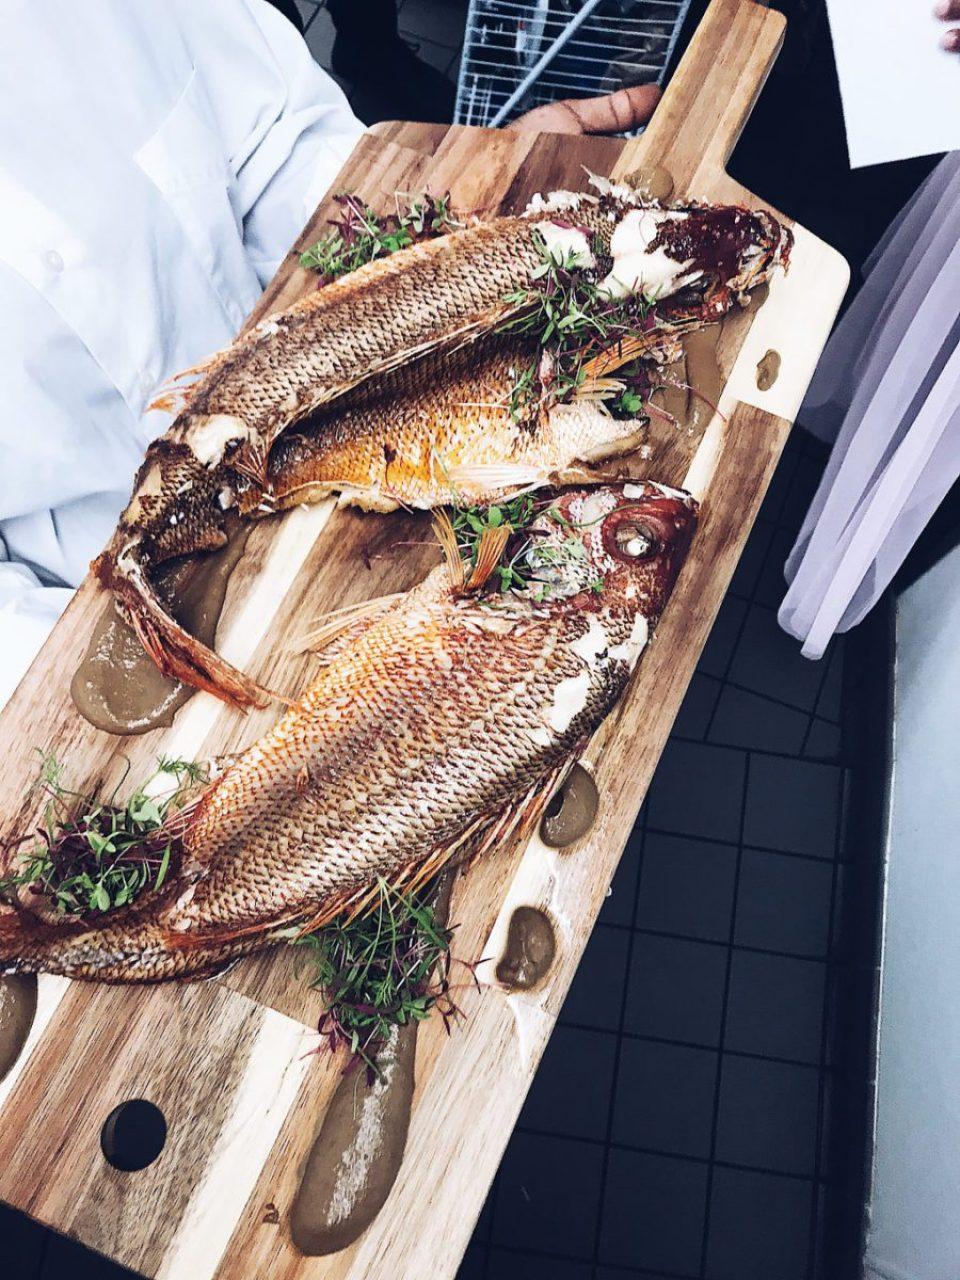 TTEKrankies-3601-960x1280 Fall Food Pairings: 6 Fish and Vegetable Pairings for Your Fall Entertaining